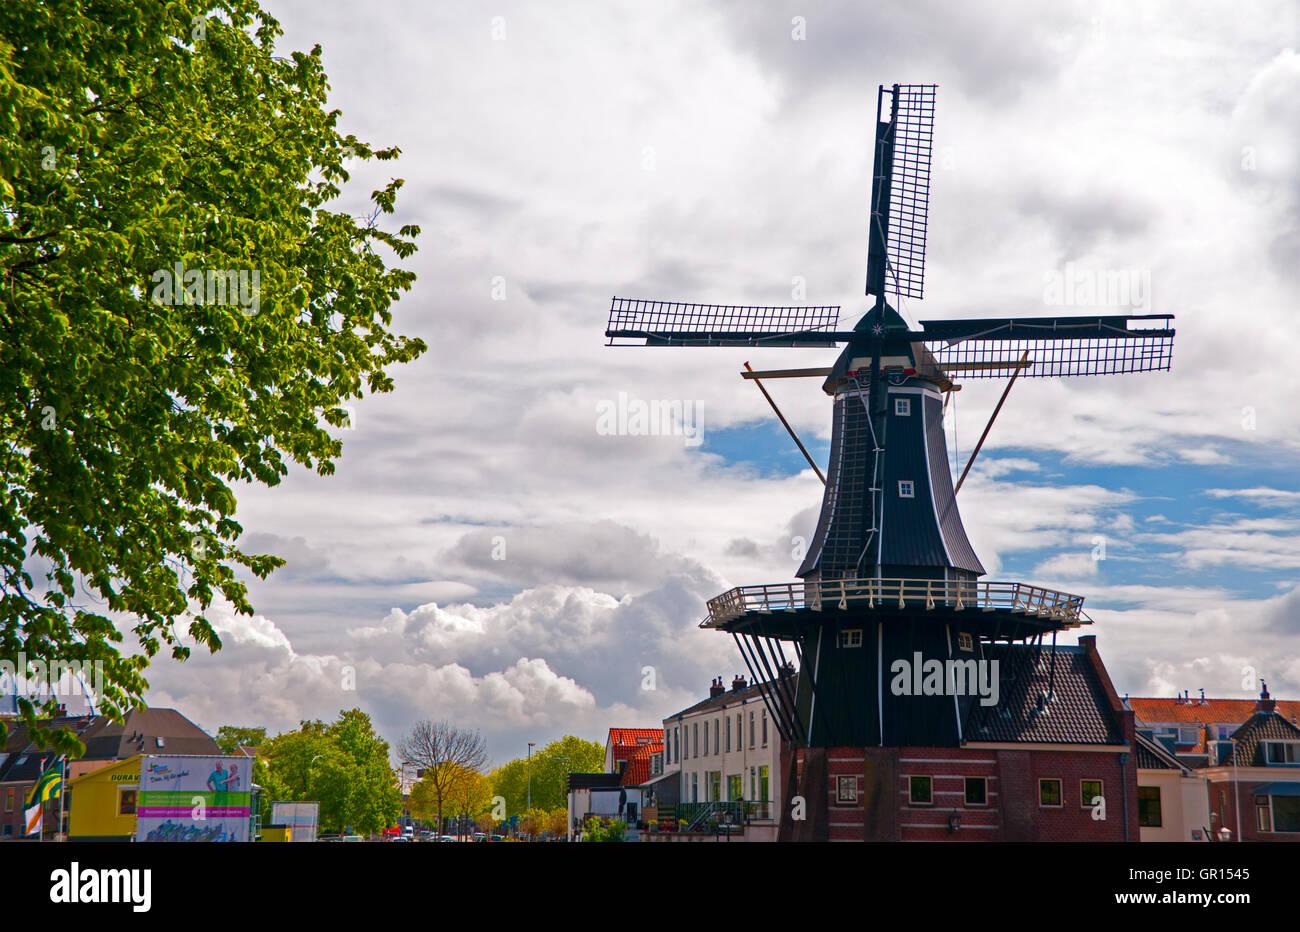 de Adriaan Windmill in Haarlem, Holland, the Netherlands - Stock Image